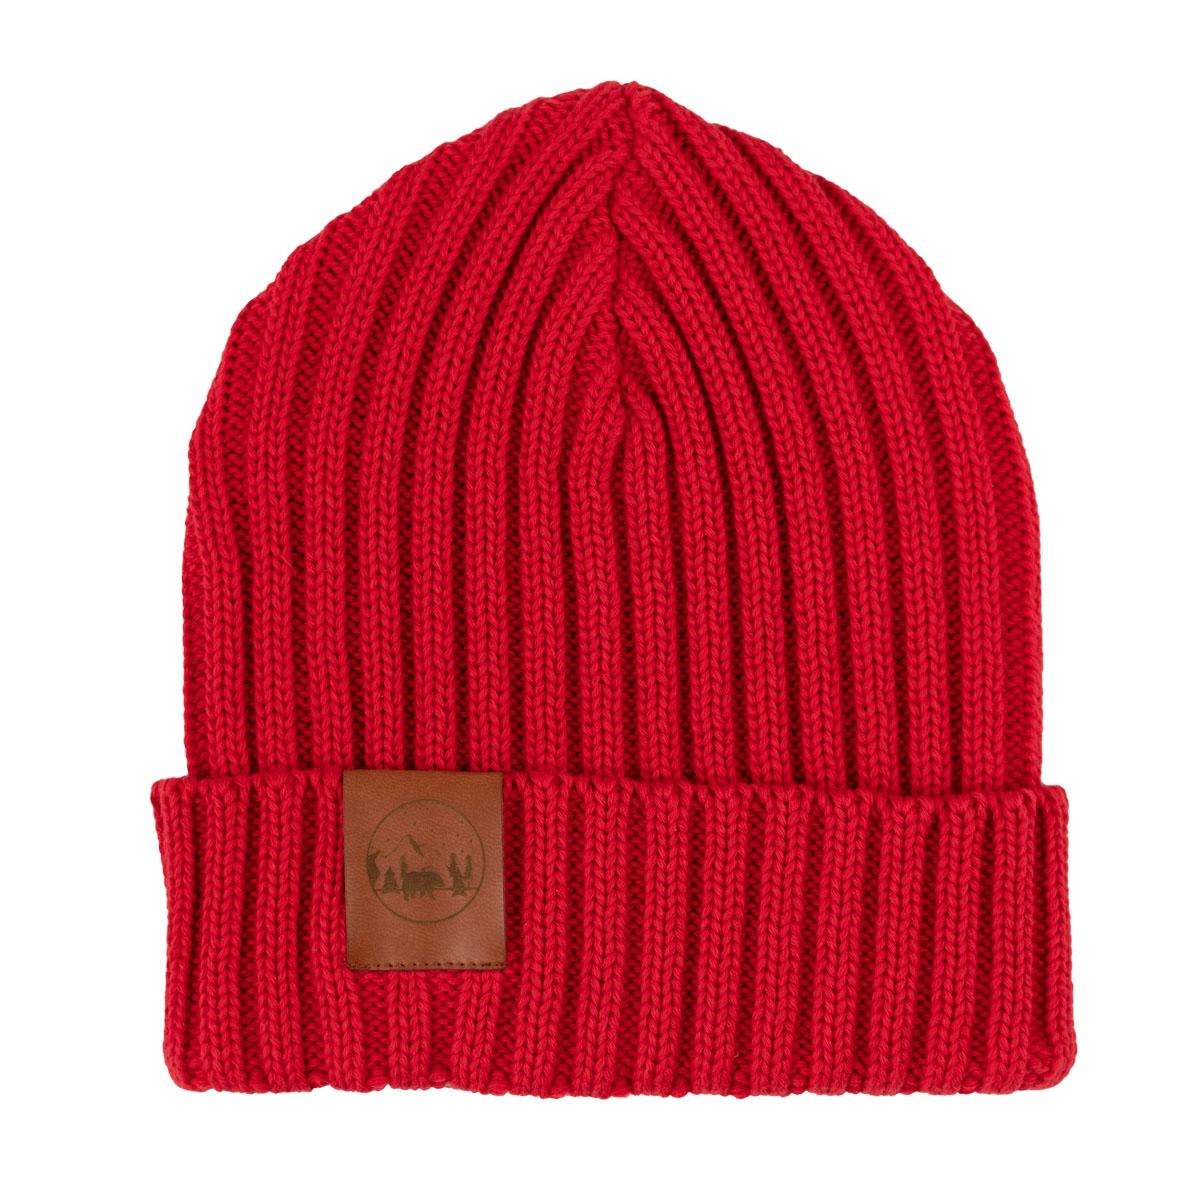 hat_alcatraz_cotton_red001D_kabak_5906742648881